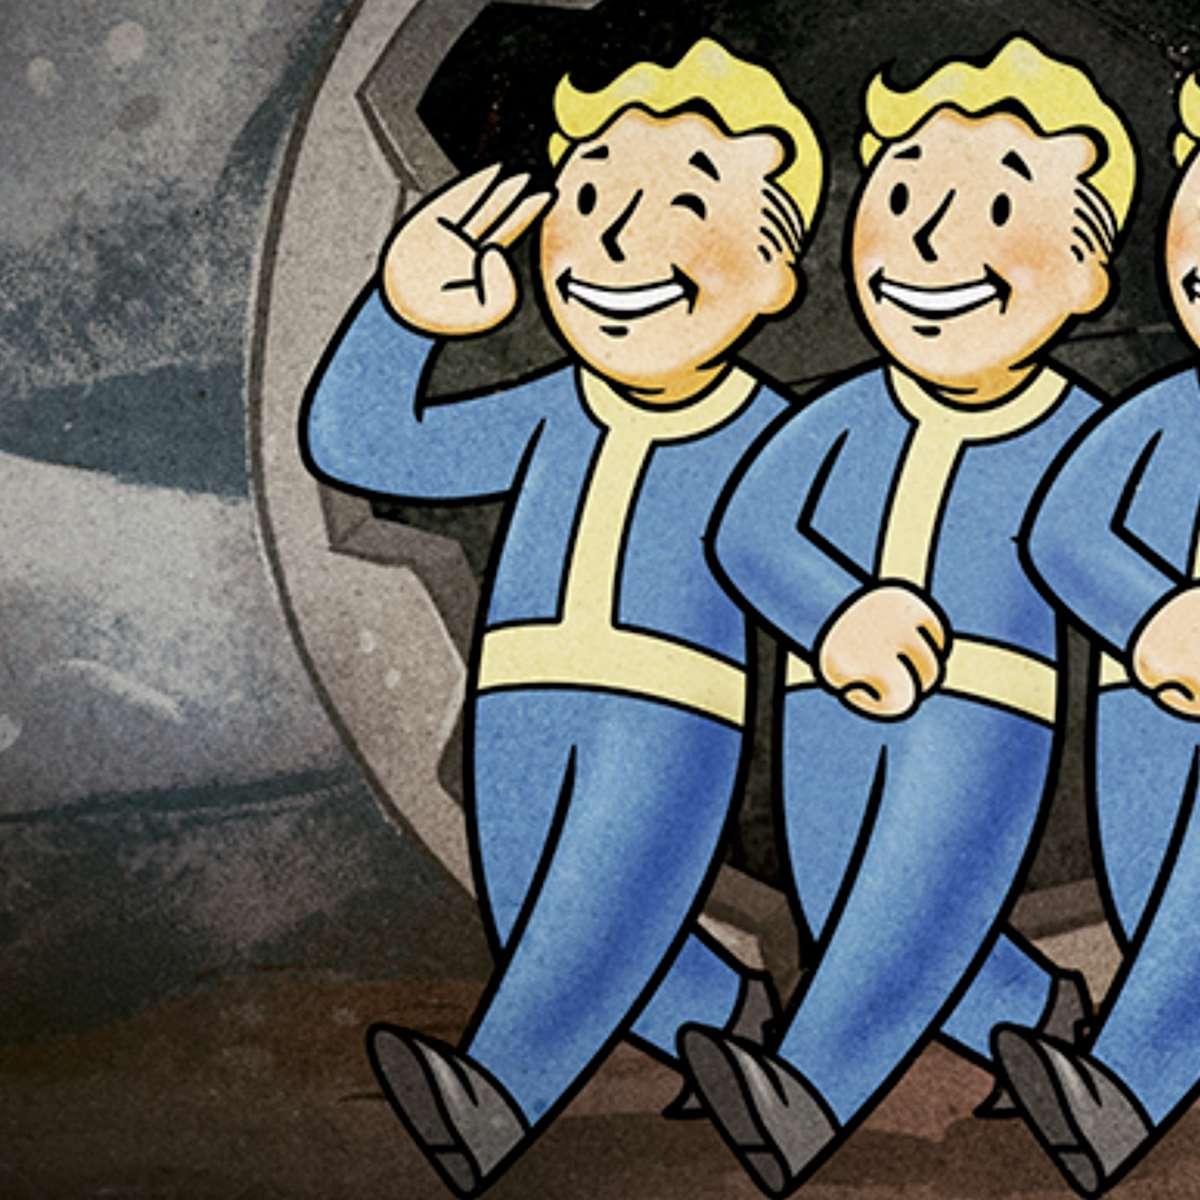 Fallout76VaultBoyTrioHero